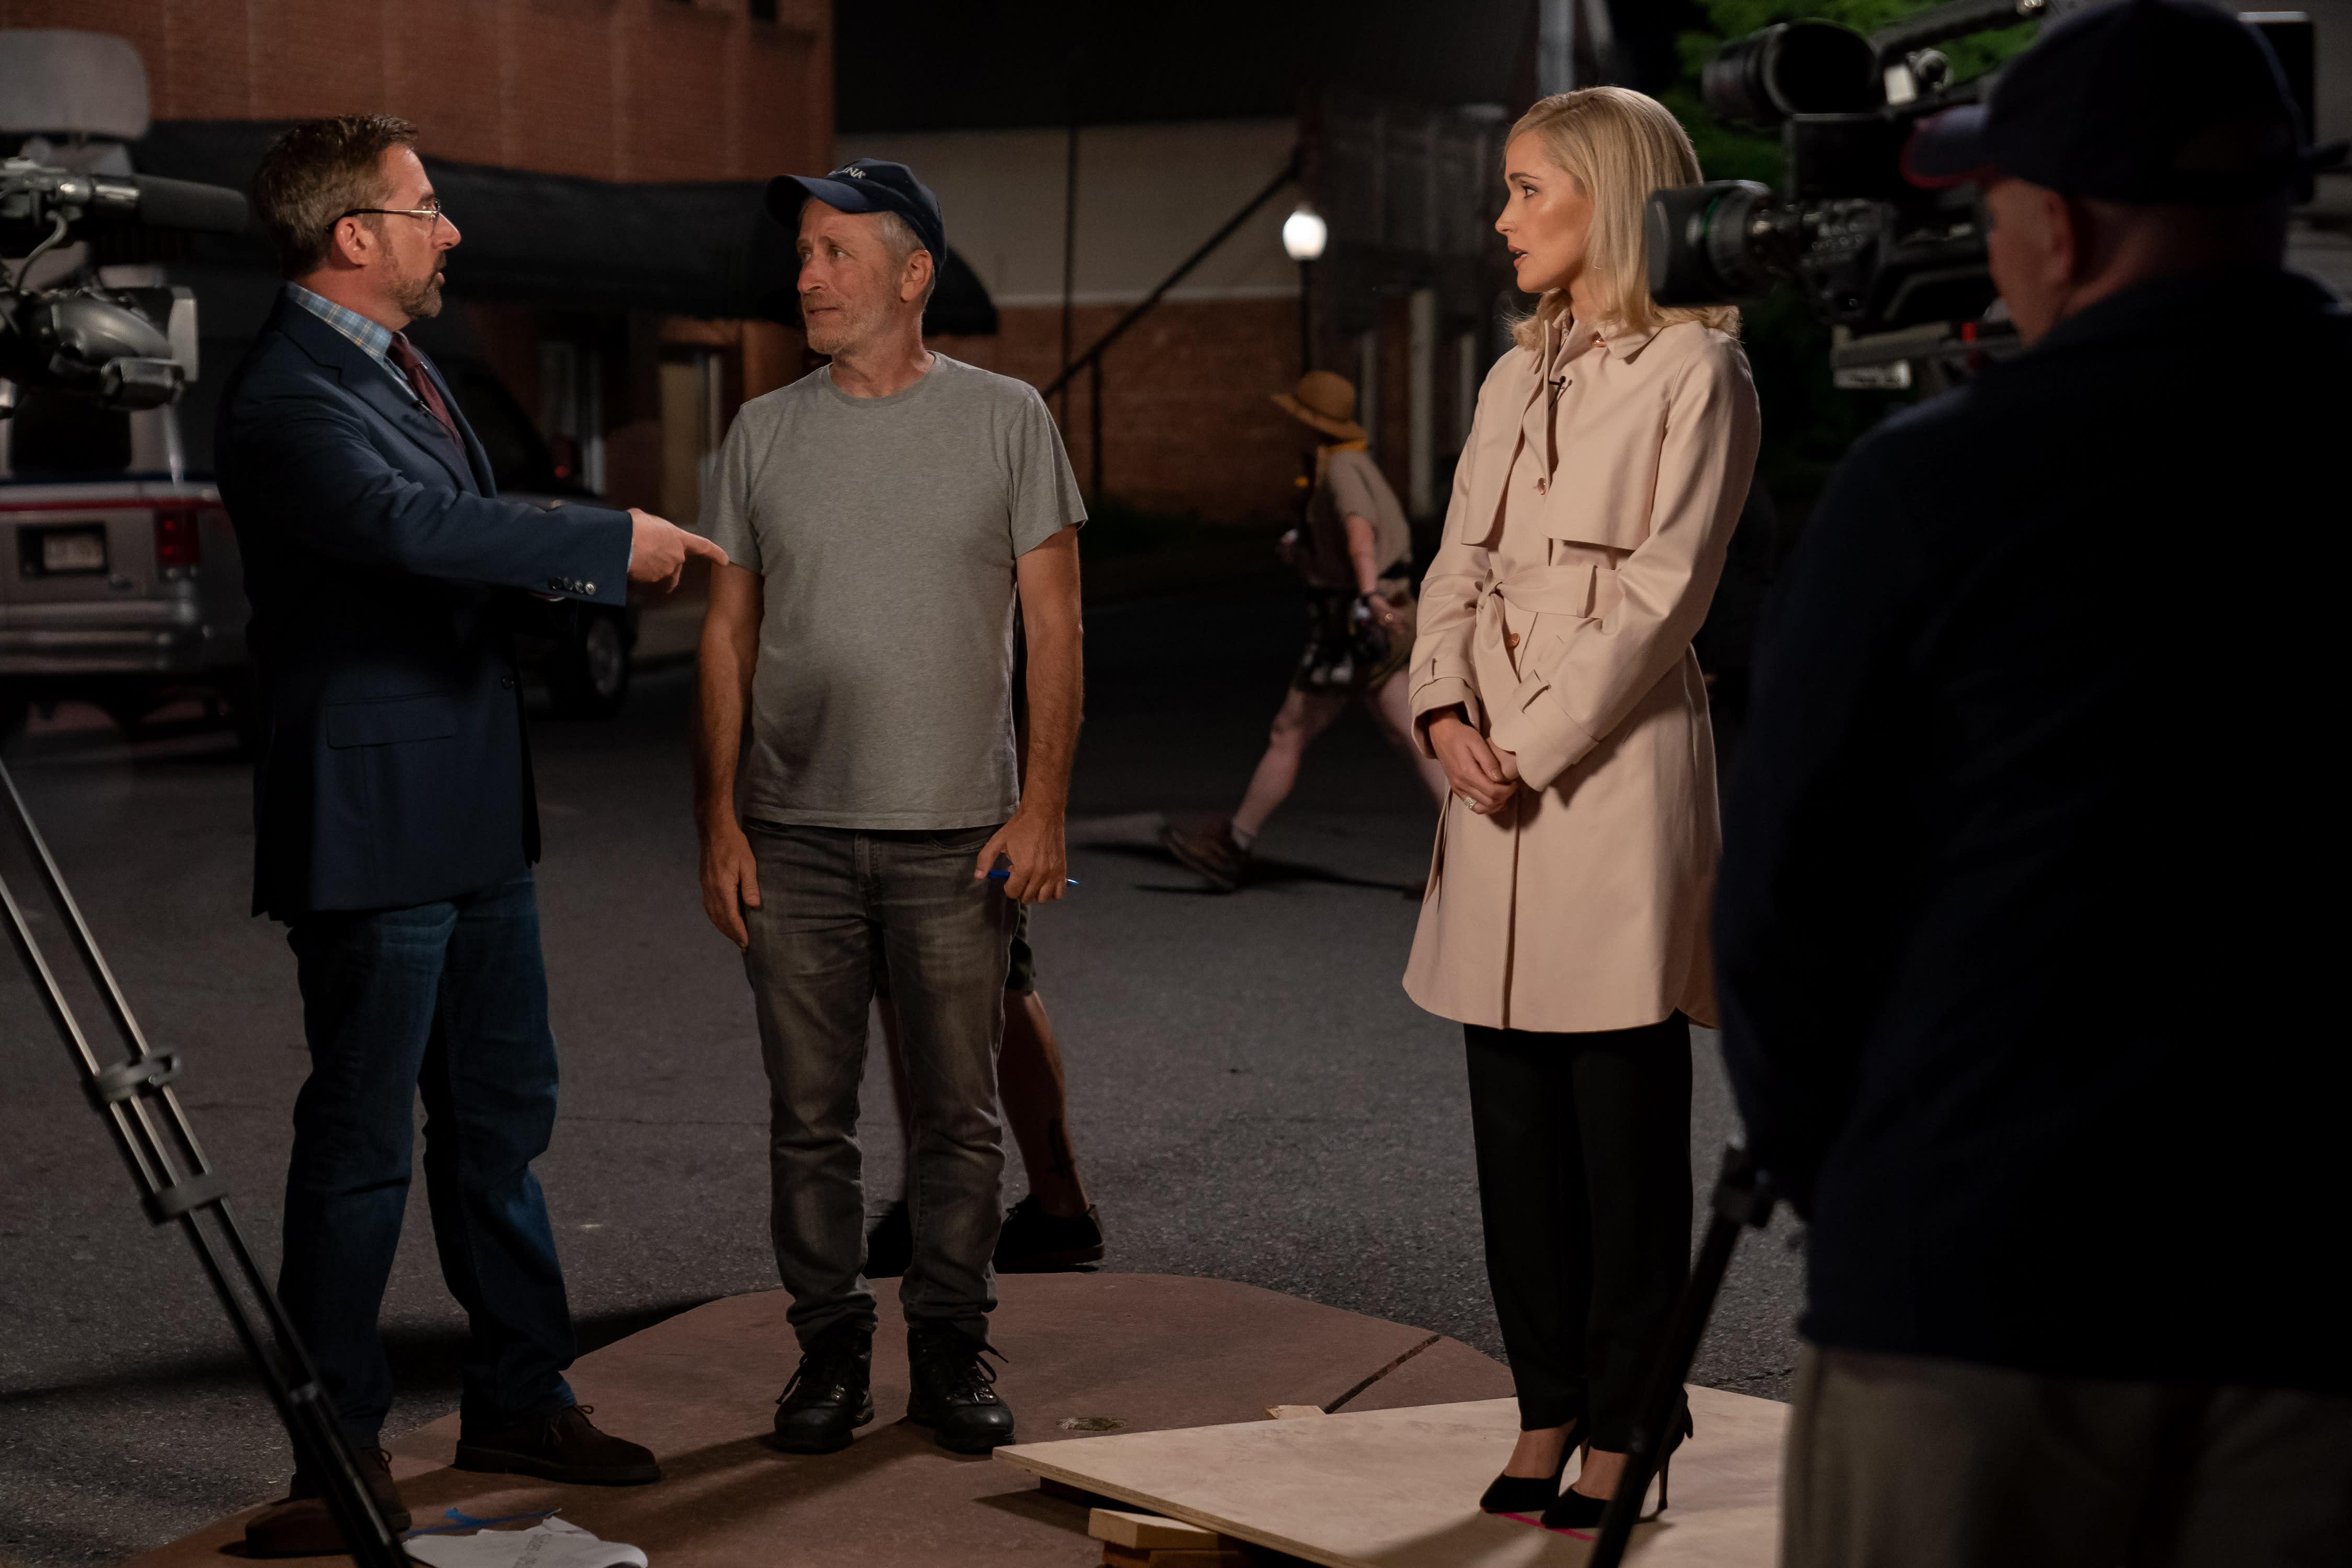 Steve Carell, Jon Stewart and Rose Byrne on the set of 'Irresistible' (Photo: Daniel McFadden / Focus Features)